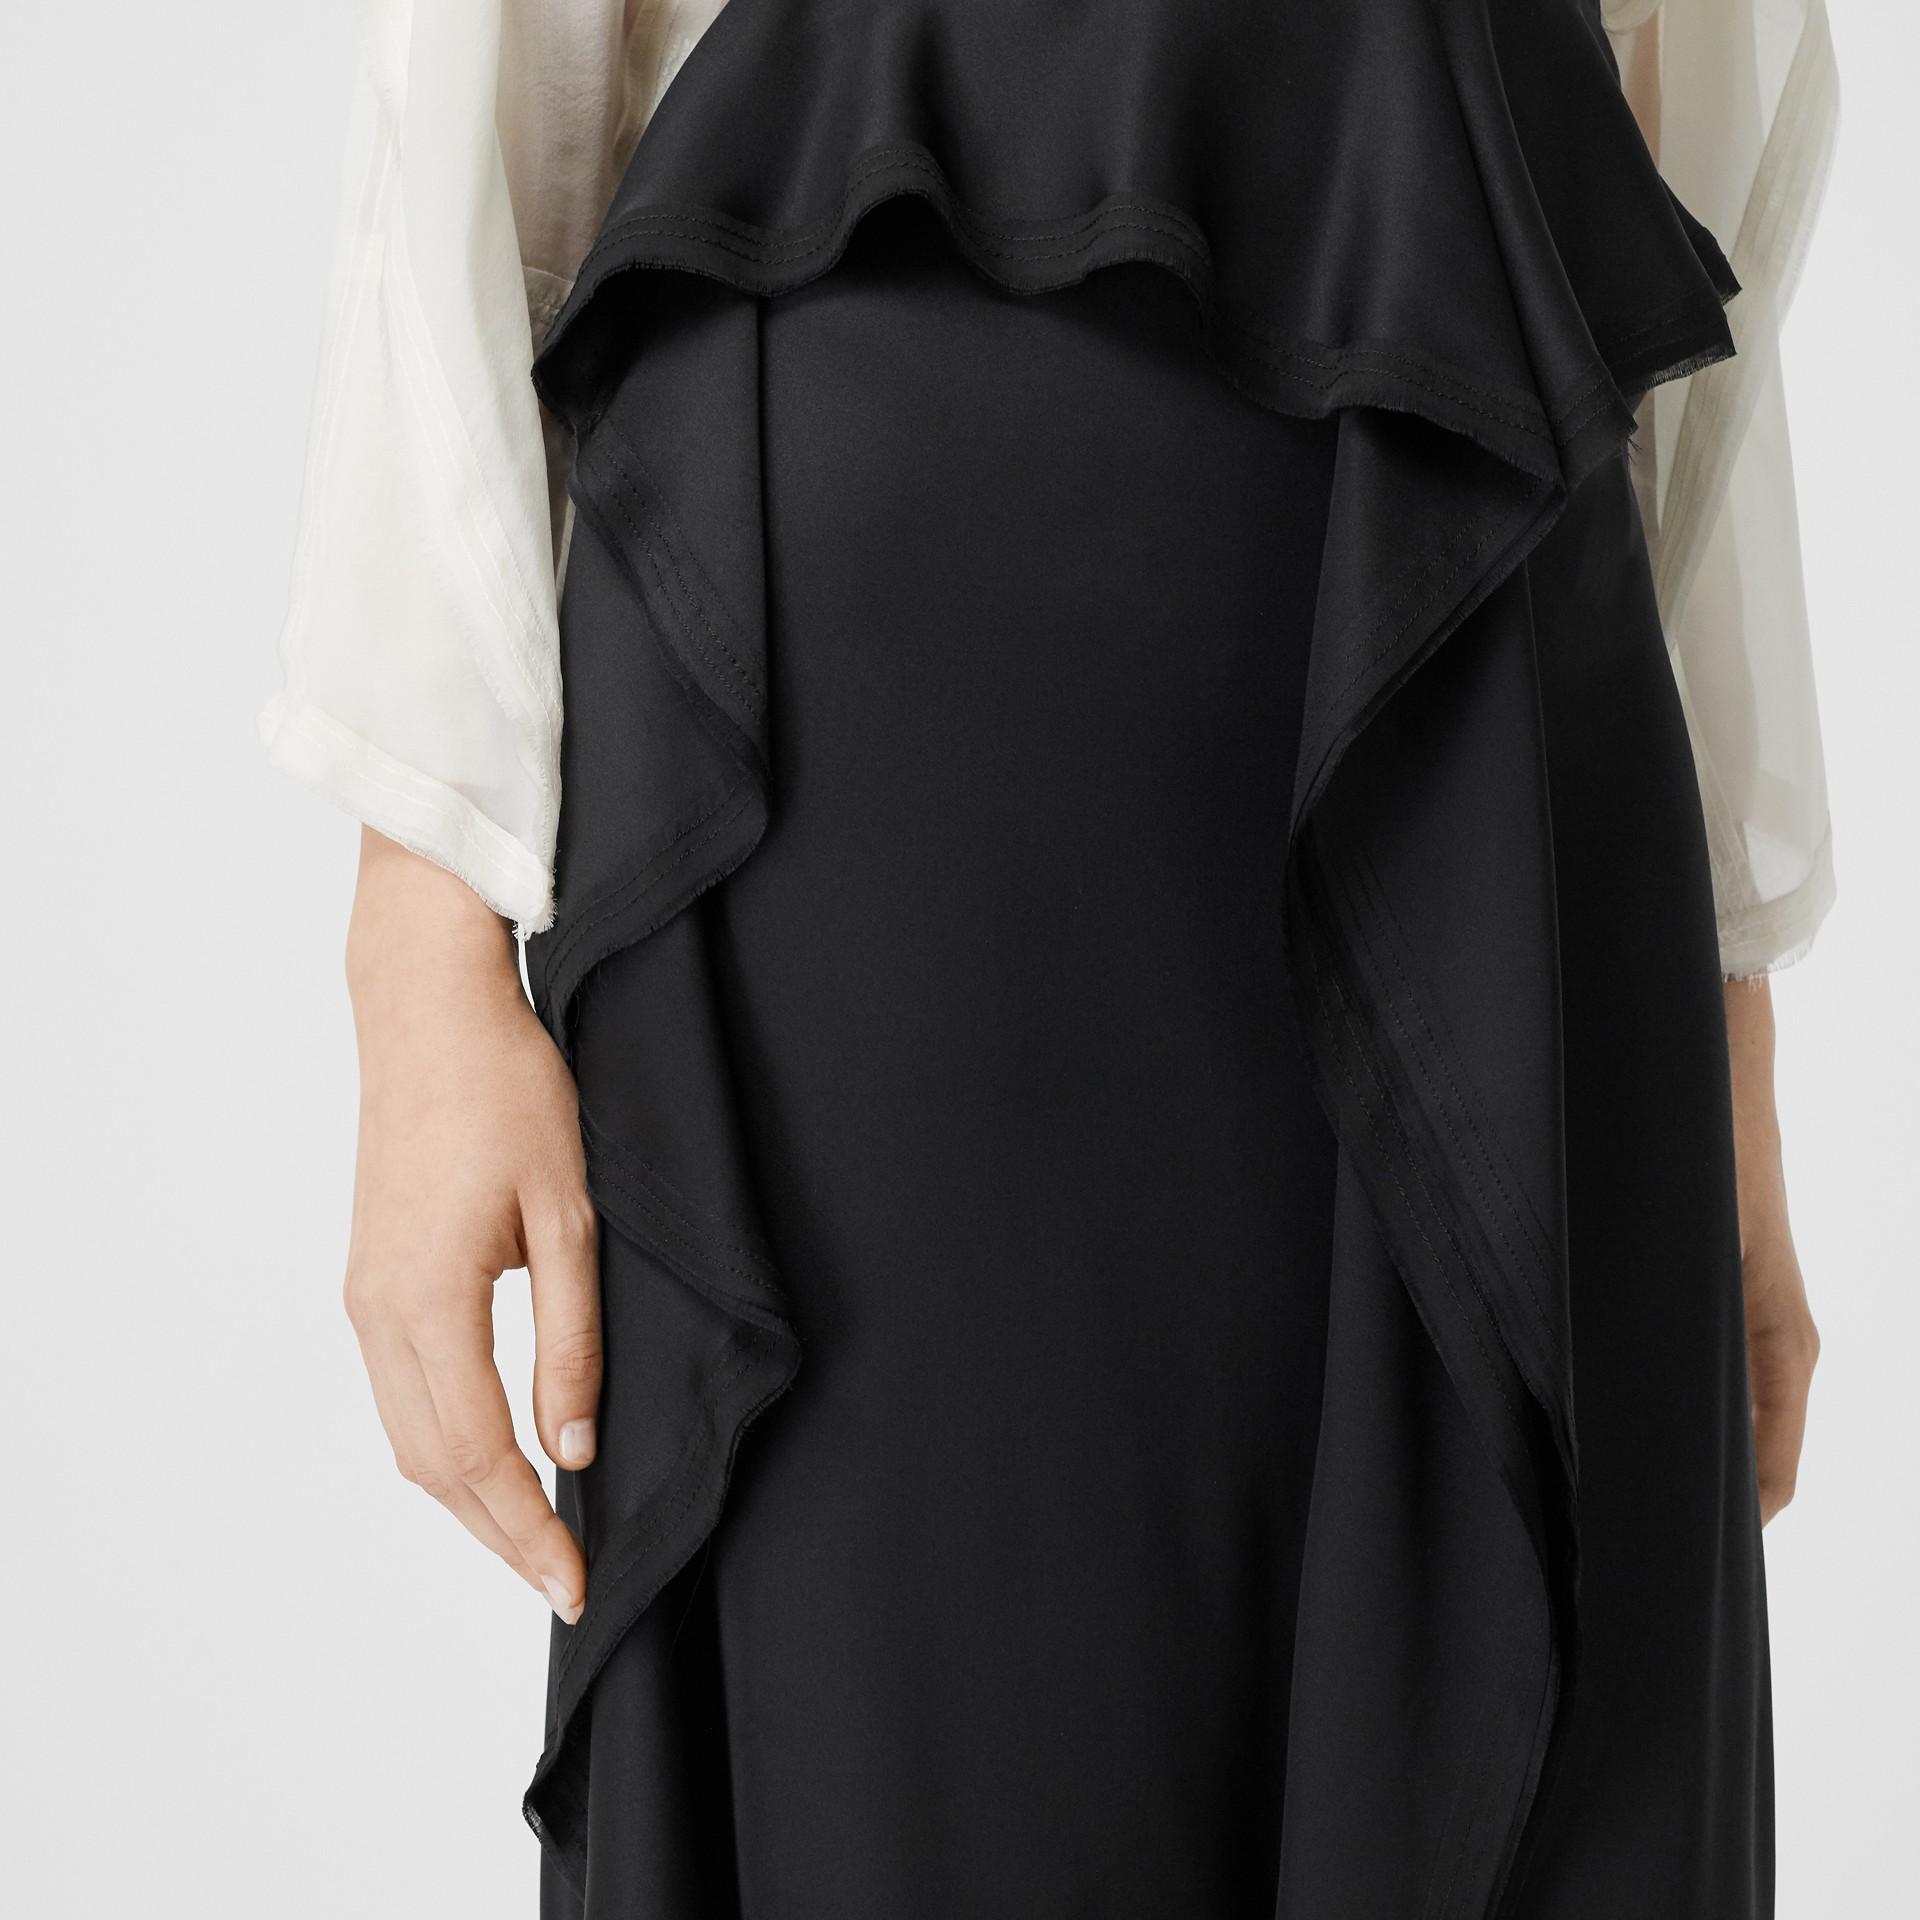 Ruffle Detail Silk Satin Pencil Skirt in Black - Women | Burberry - gallery image 5